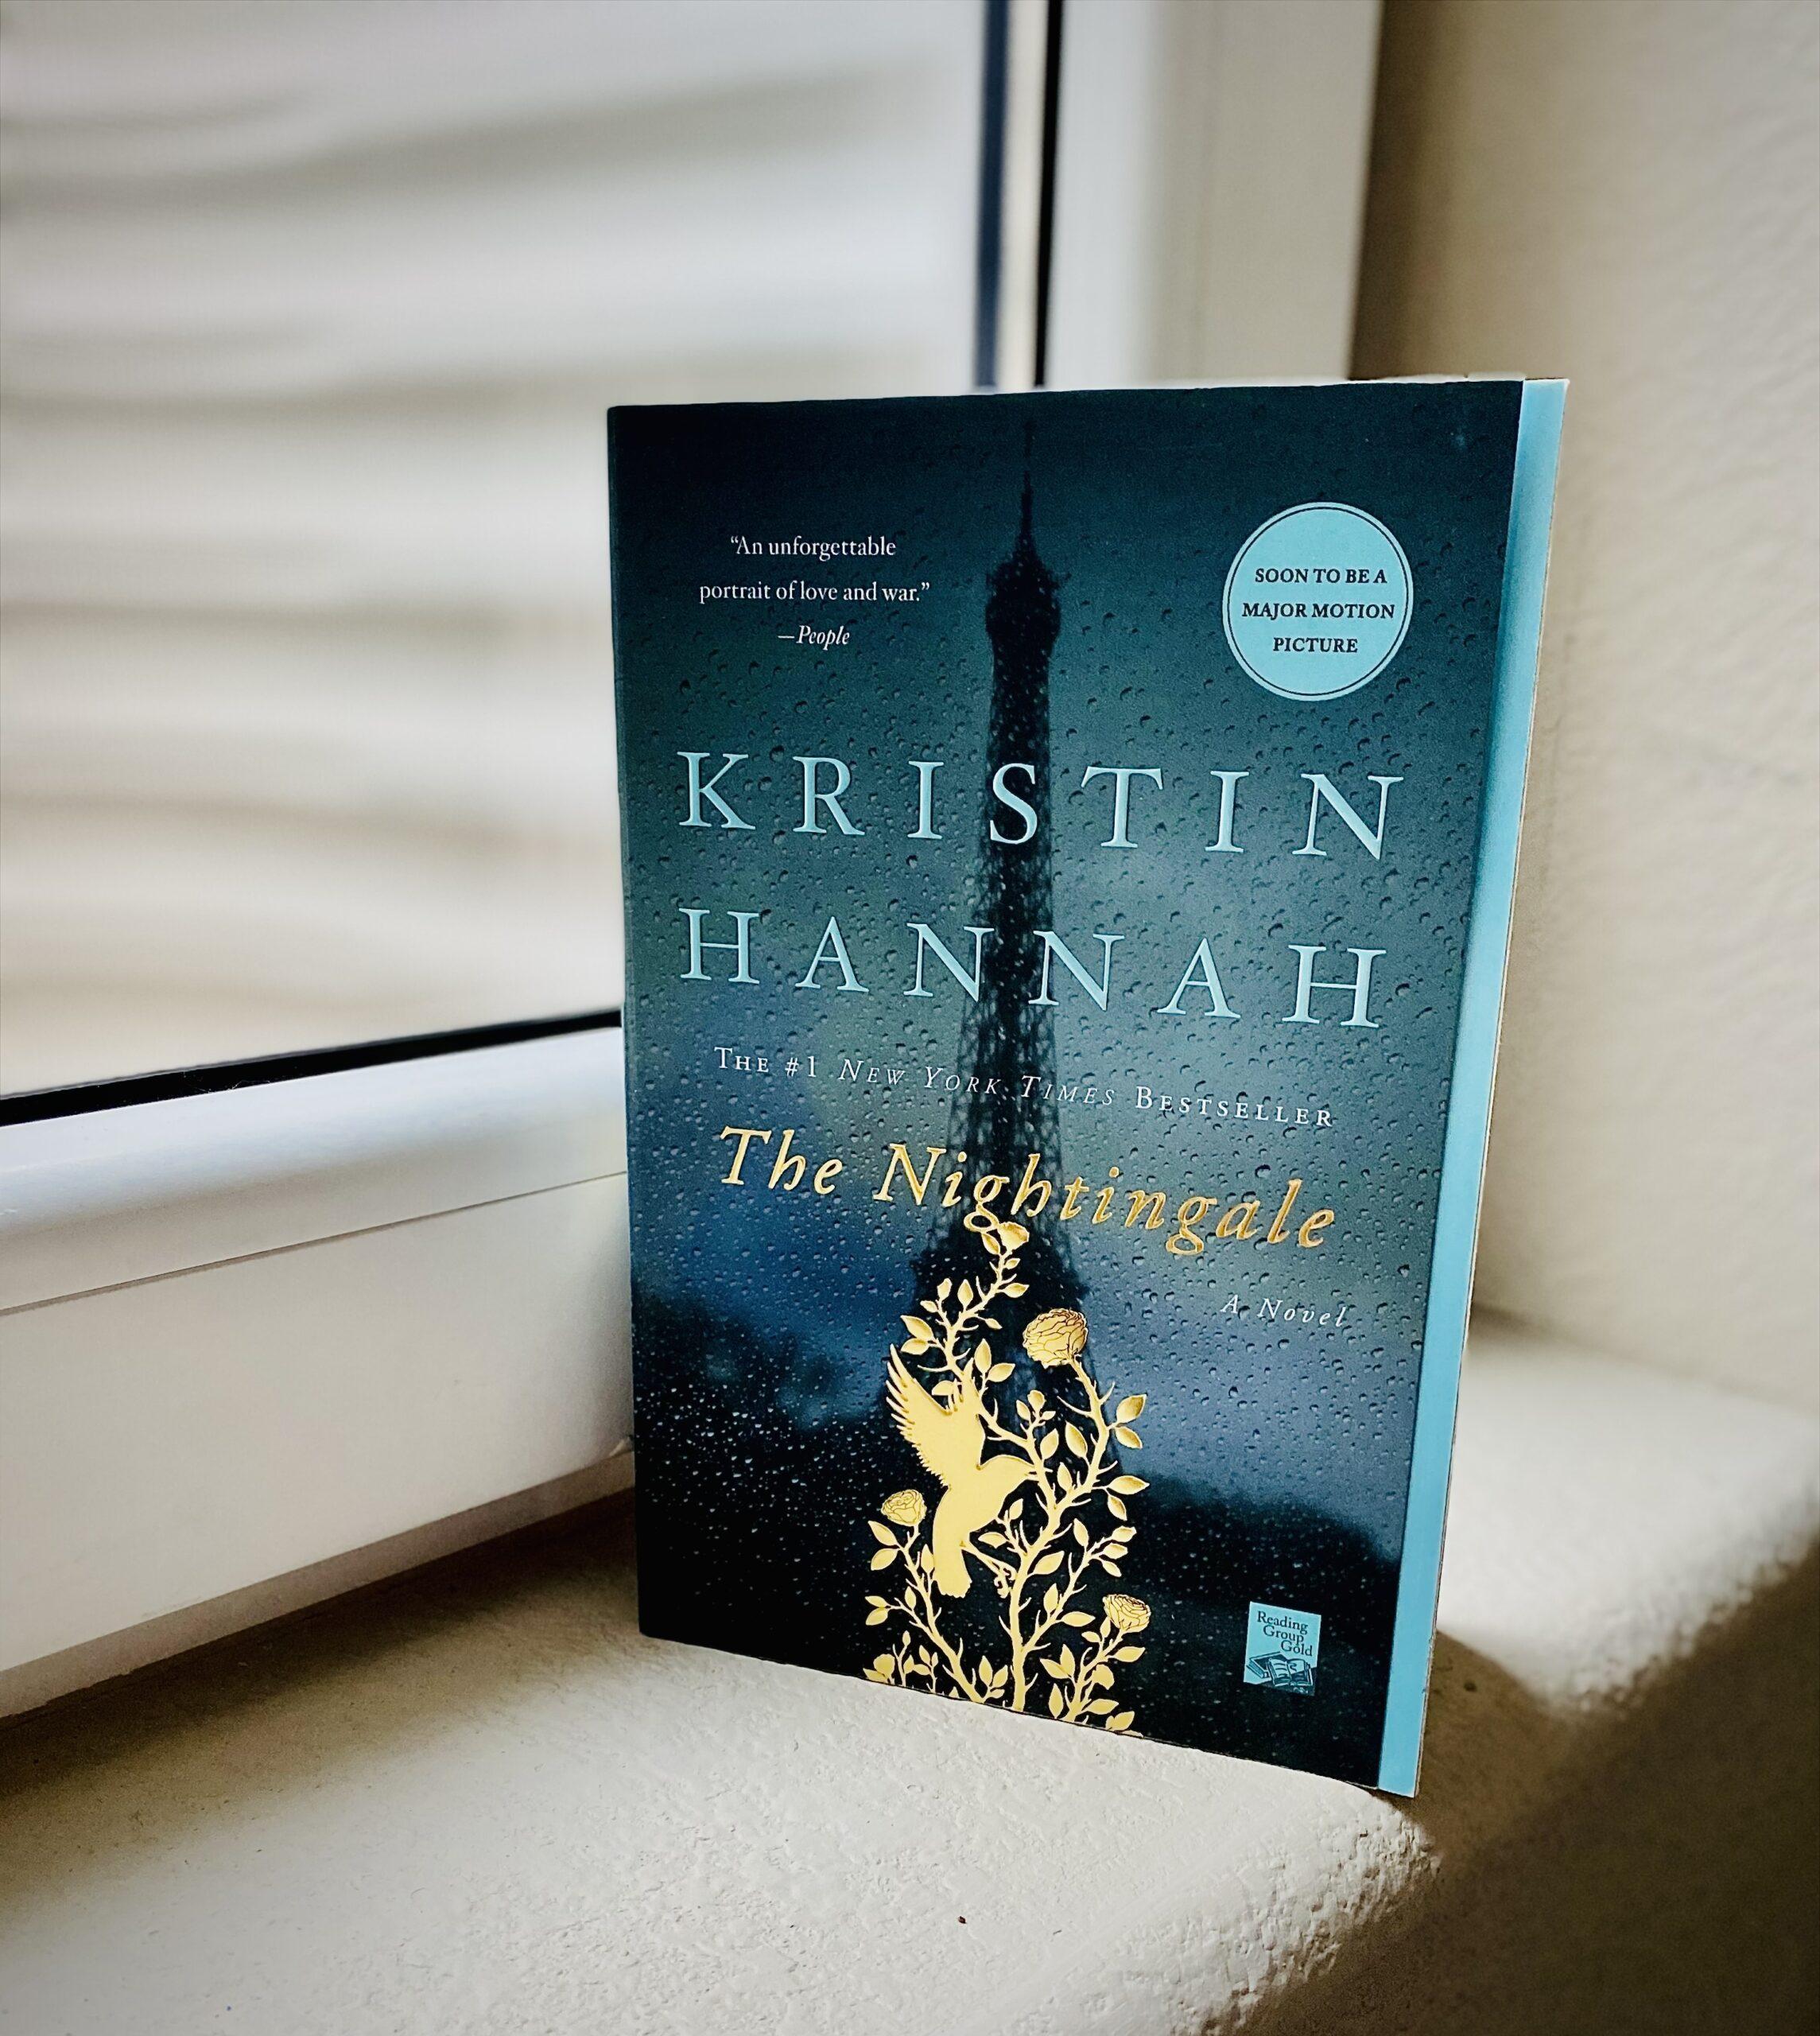 the nightingale, kristen hannah, movies based on books, fanning sisters, the nightingale movie